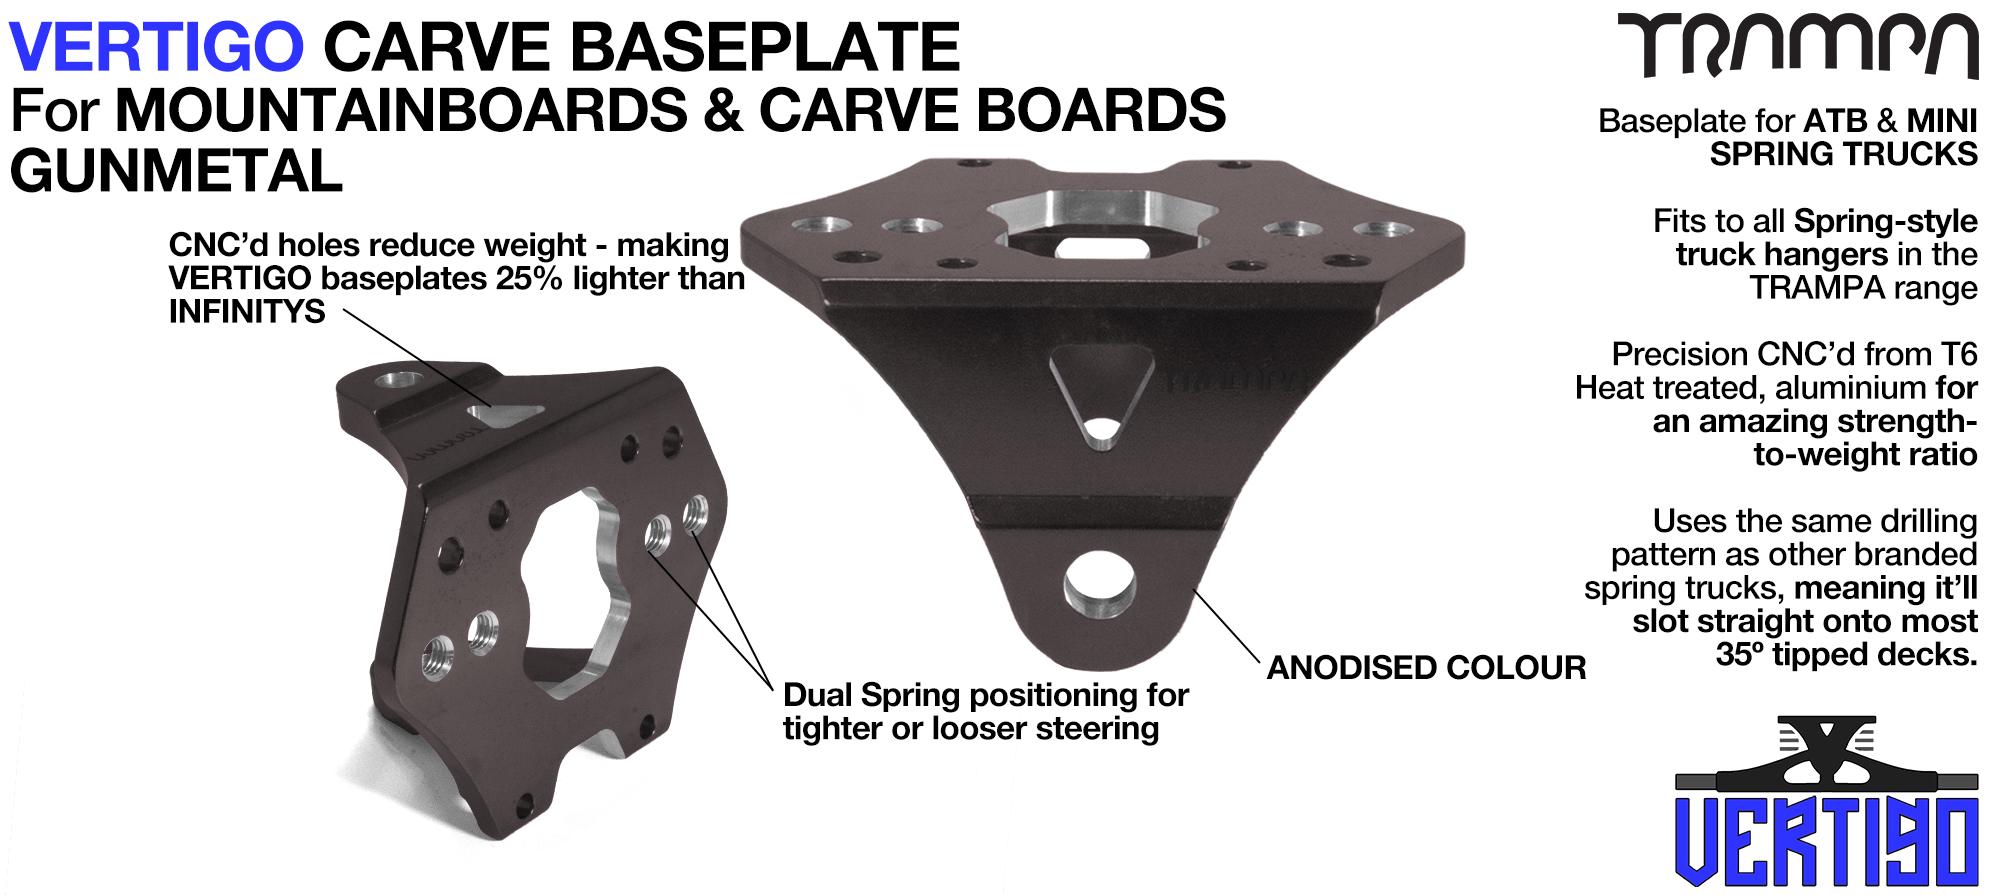 VERTIGO Baseplate GUNMETAL - T6 Aluminum Anodised & CNC lightened - Black logo  Carve